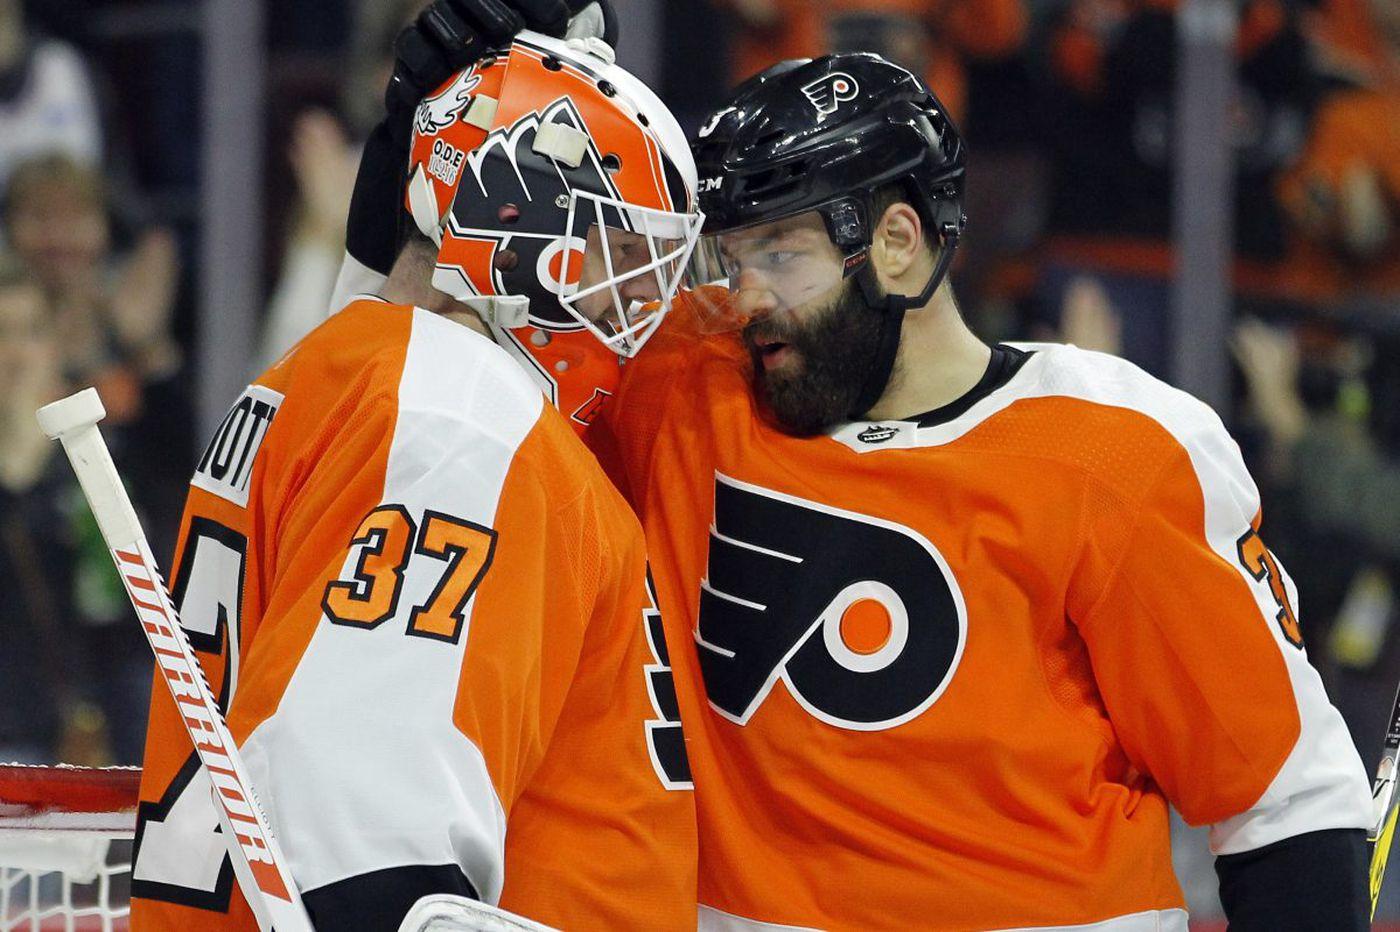 Flyers coach Dave Hakstol seems set to keep Brian Elliott in goal | Sam Donnellon